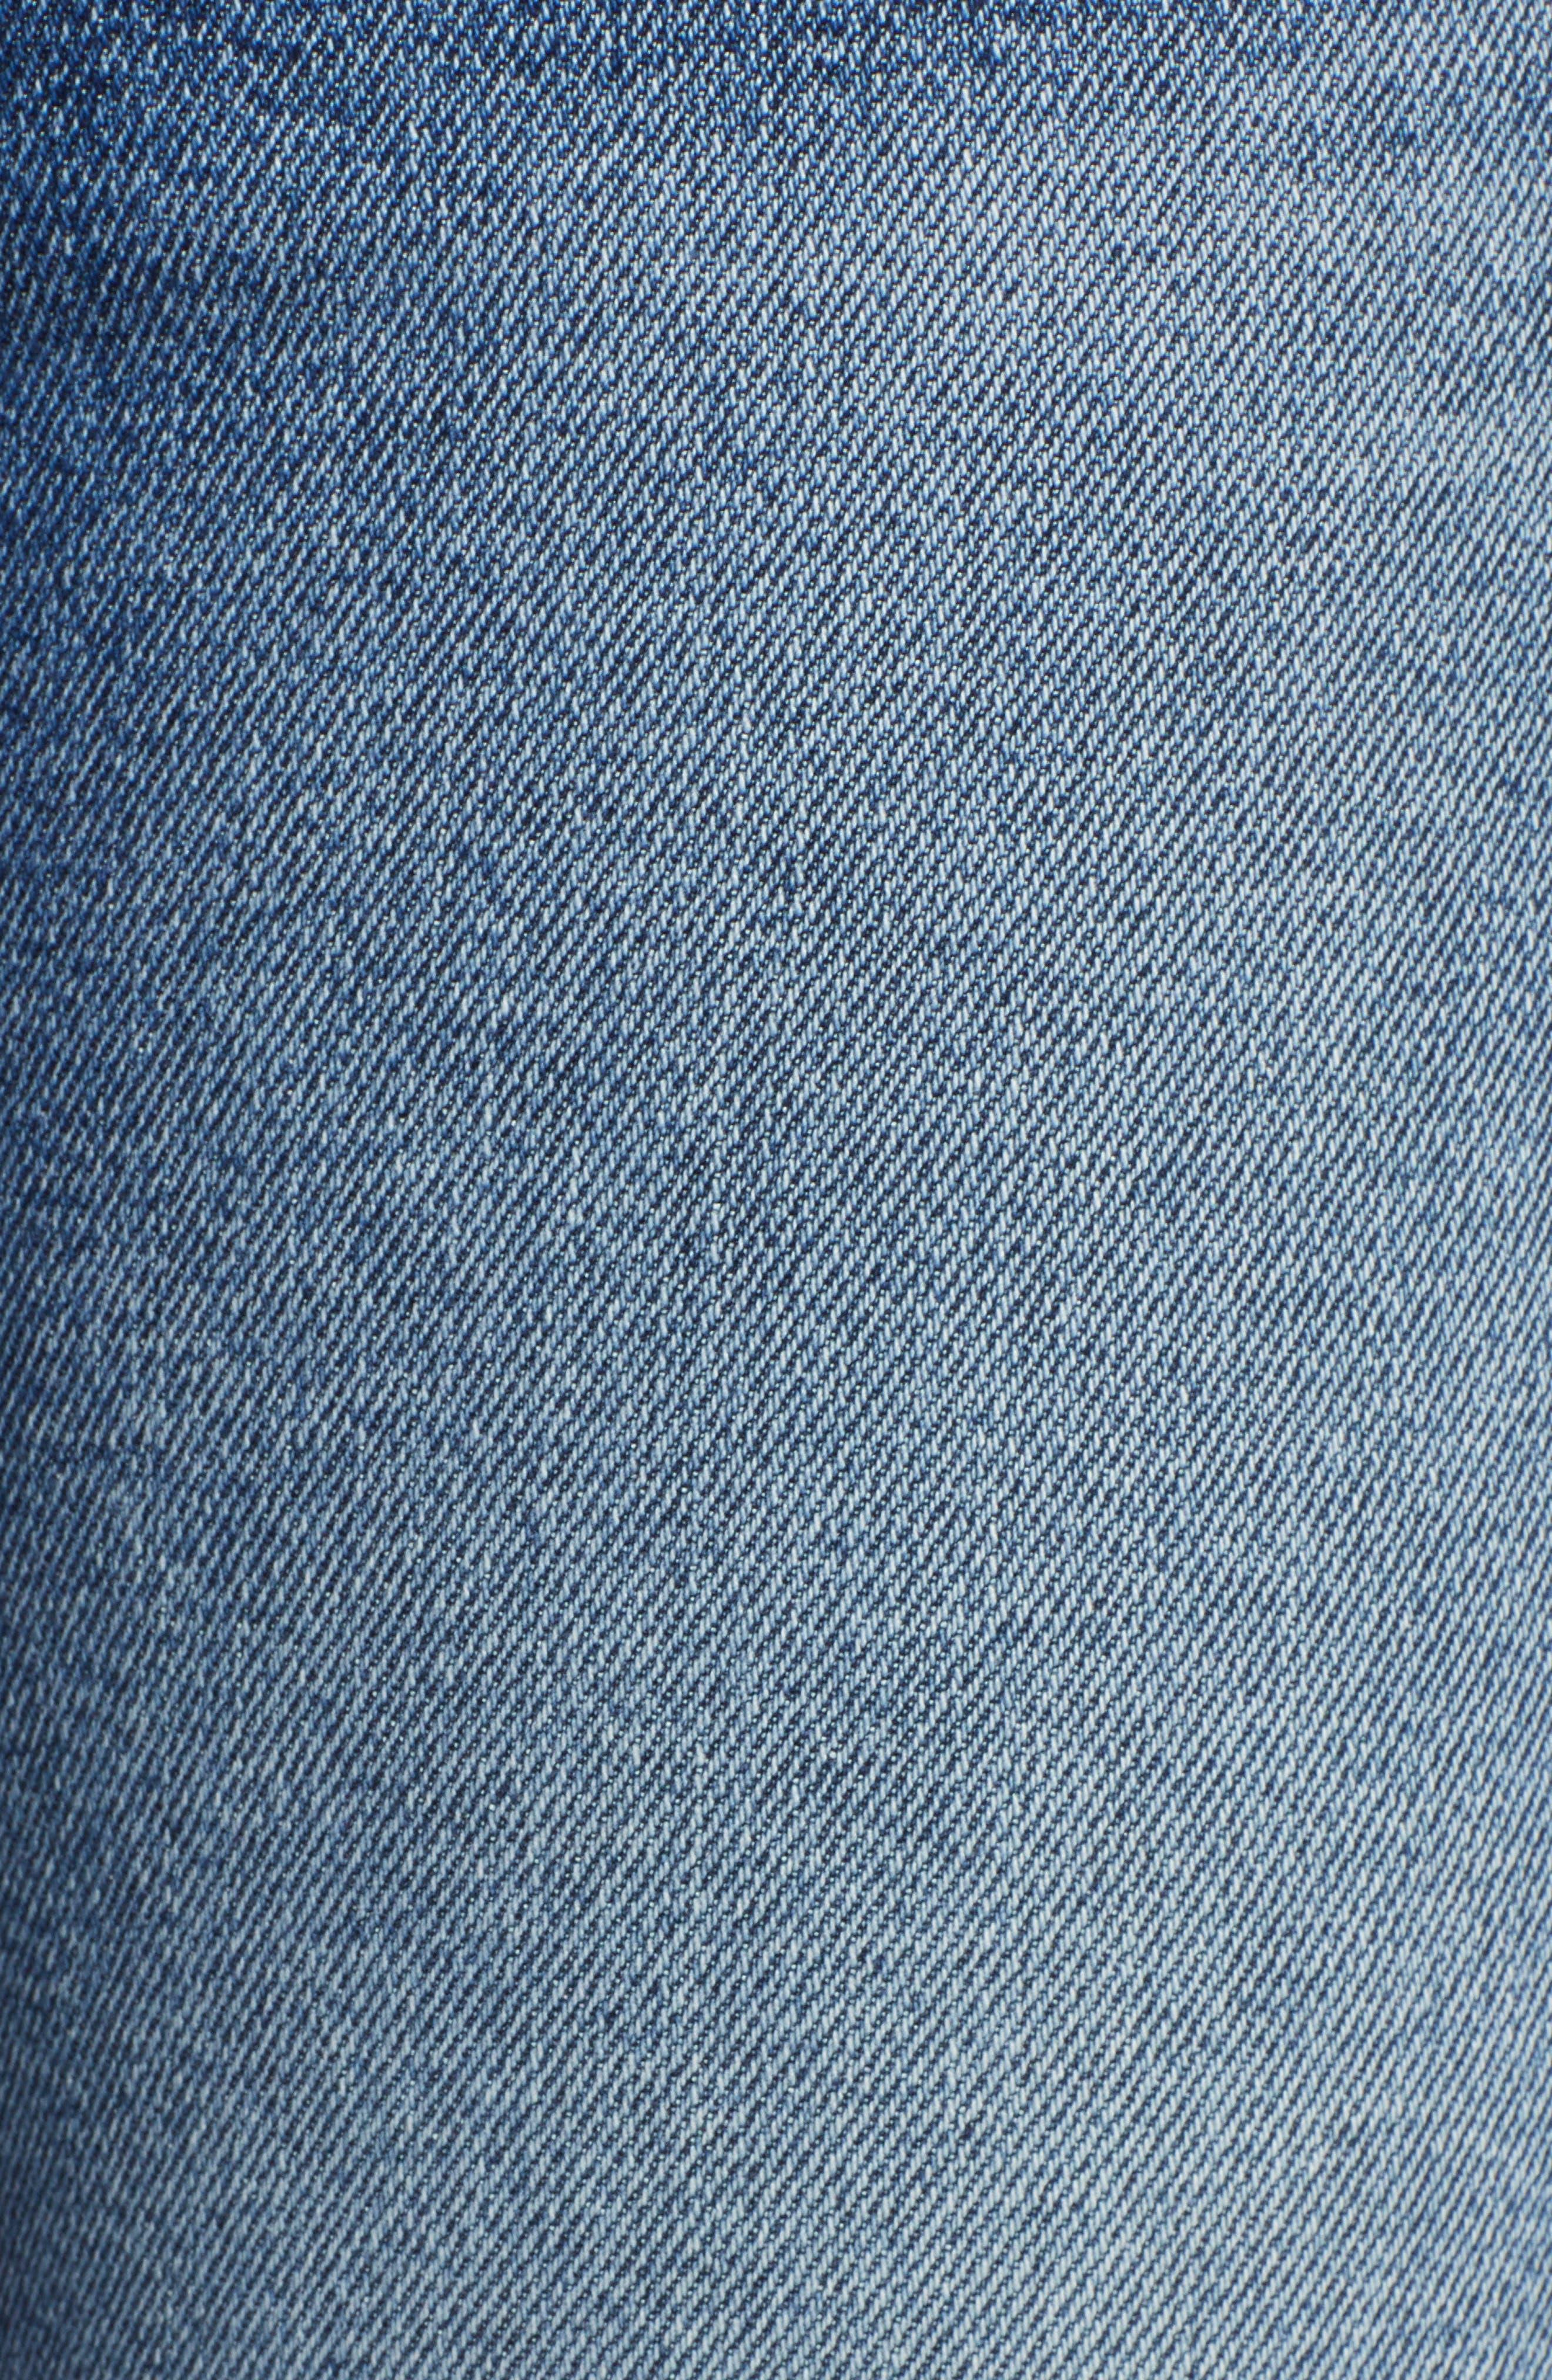 Luxe Vintage Roxanne Rip Hem Ankle Slim Jeans,                             Alternate thumbnail 6, color,                             401